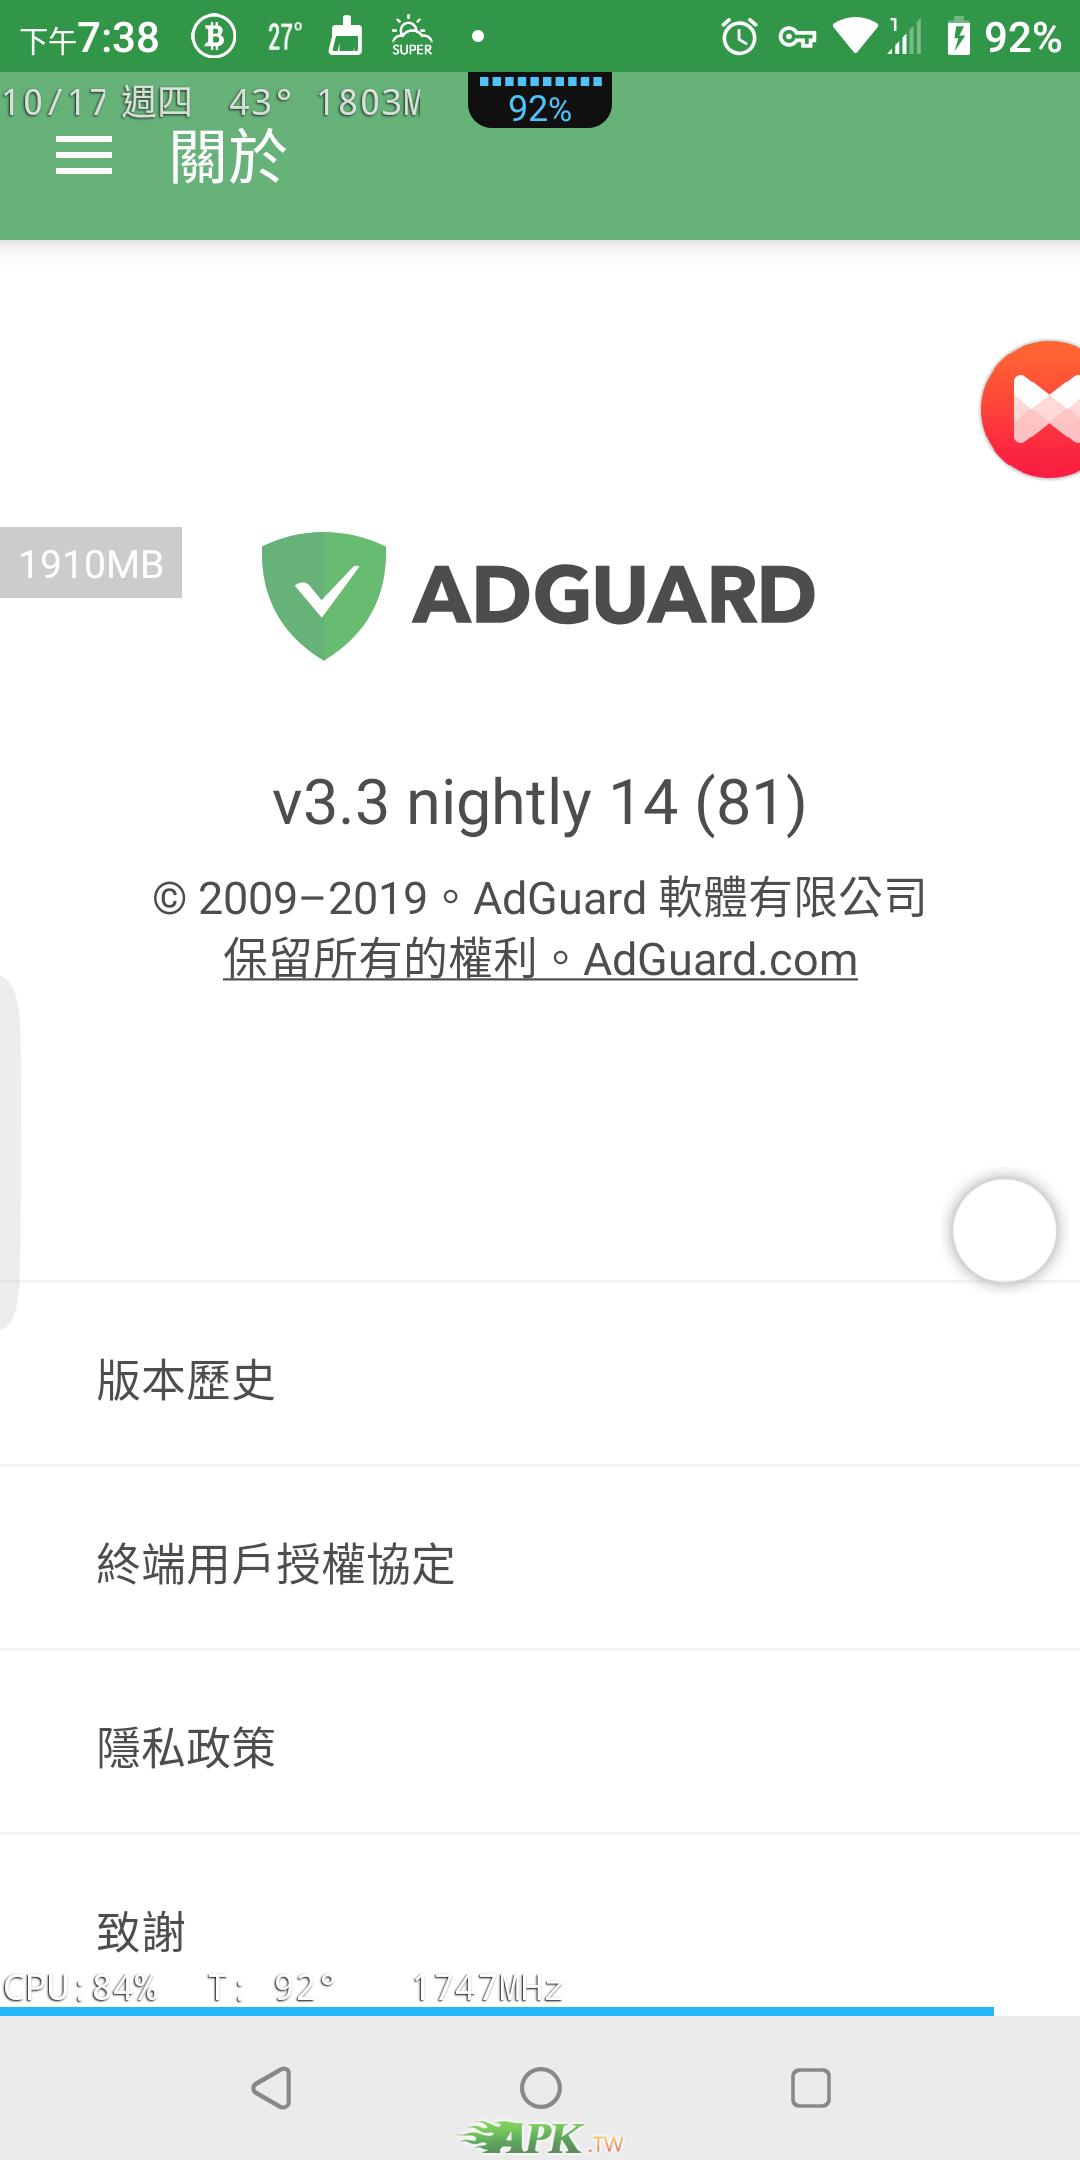 Screenshot_20191017-193845.png